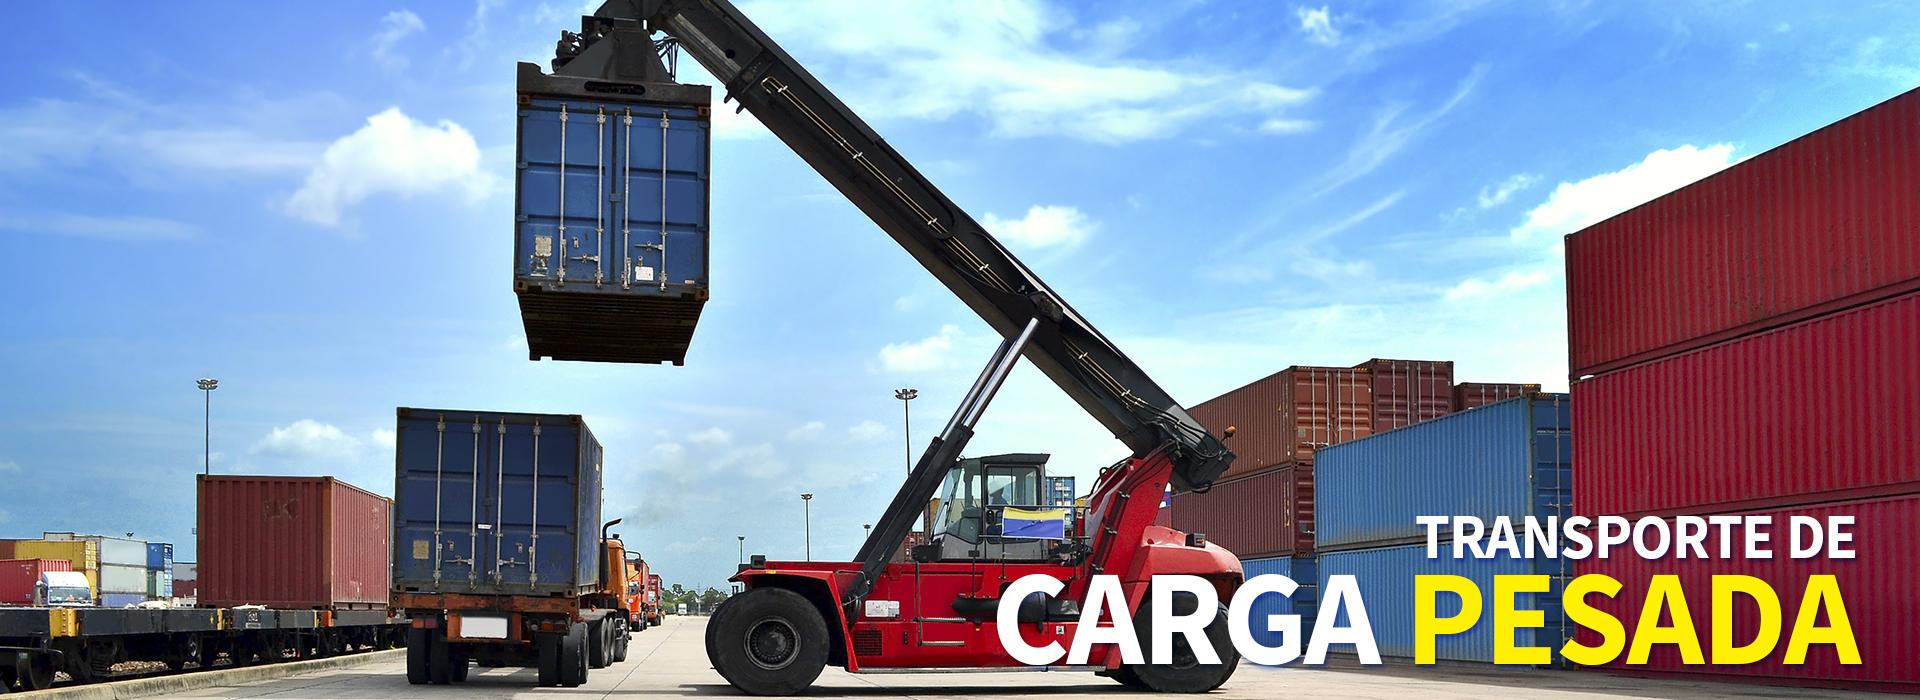 carga pesada 3